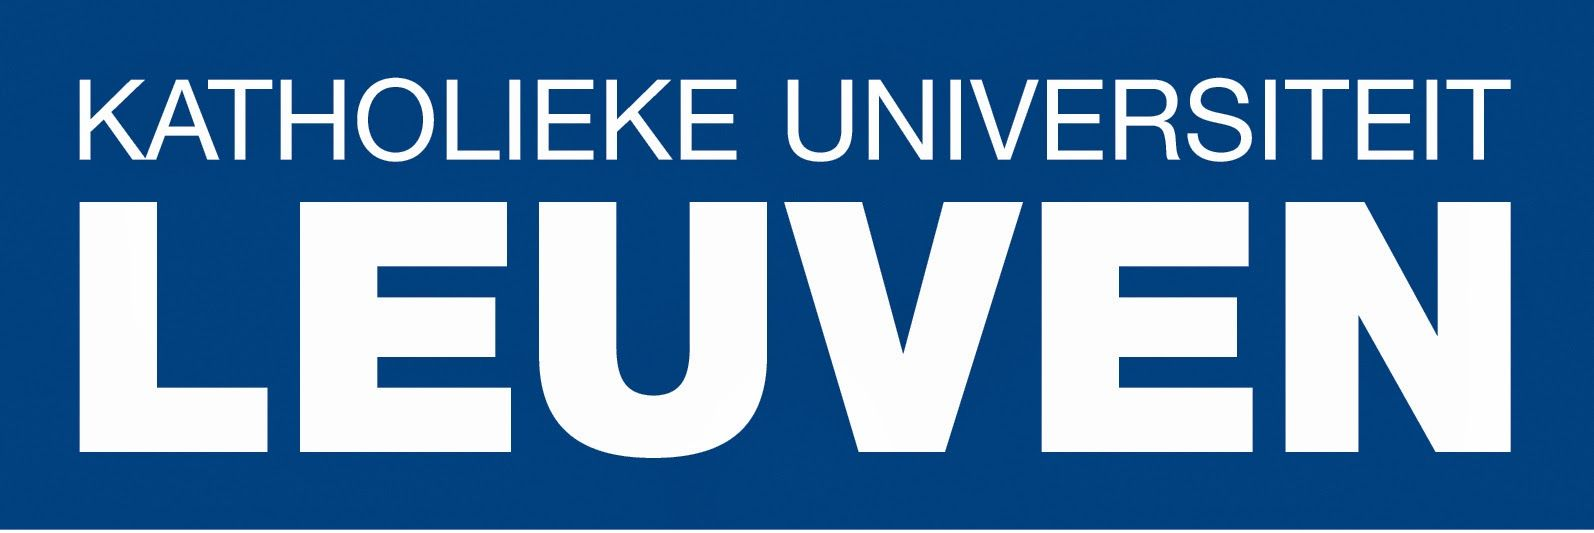 International Studens A Master S Program And Scholarship